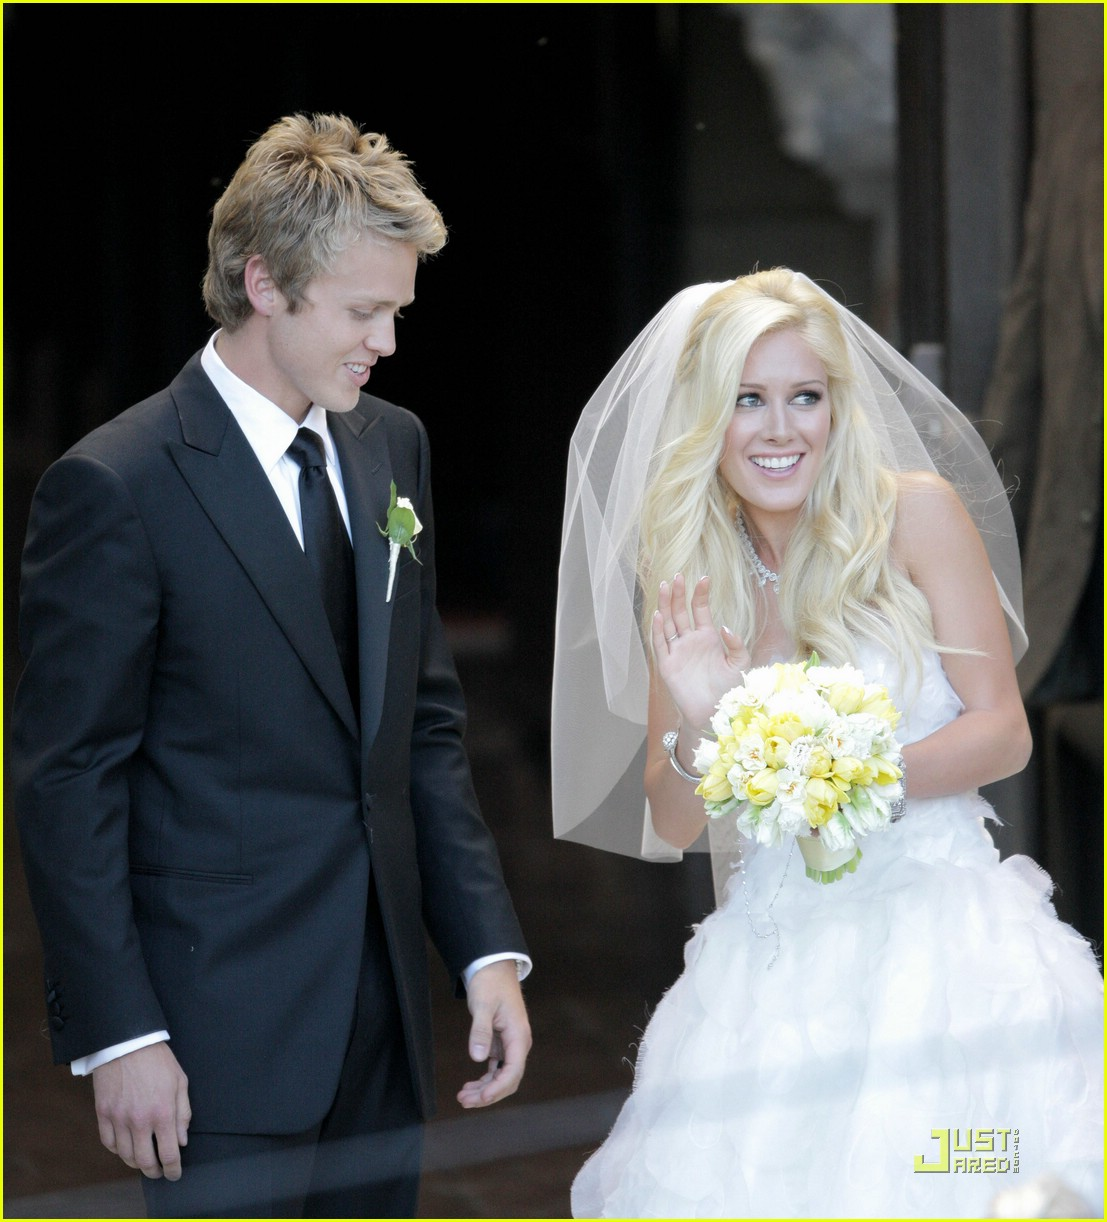 Full Sized Photo Of Heidi Montag Spencer Pratt Wedding11 Photo 1880231 Ju